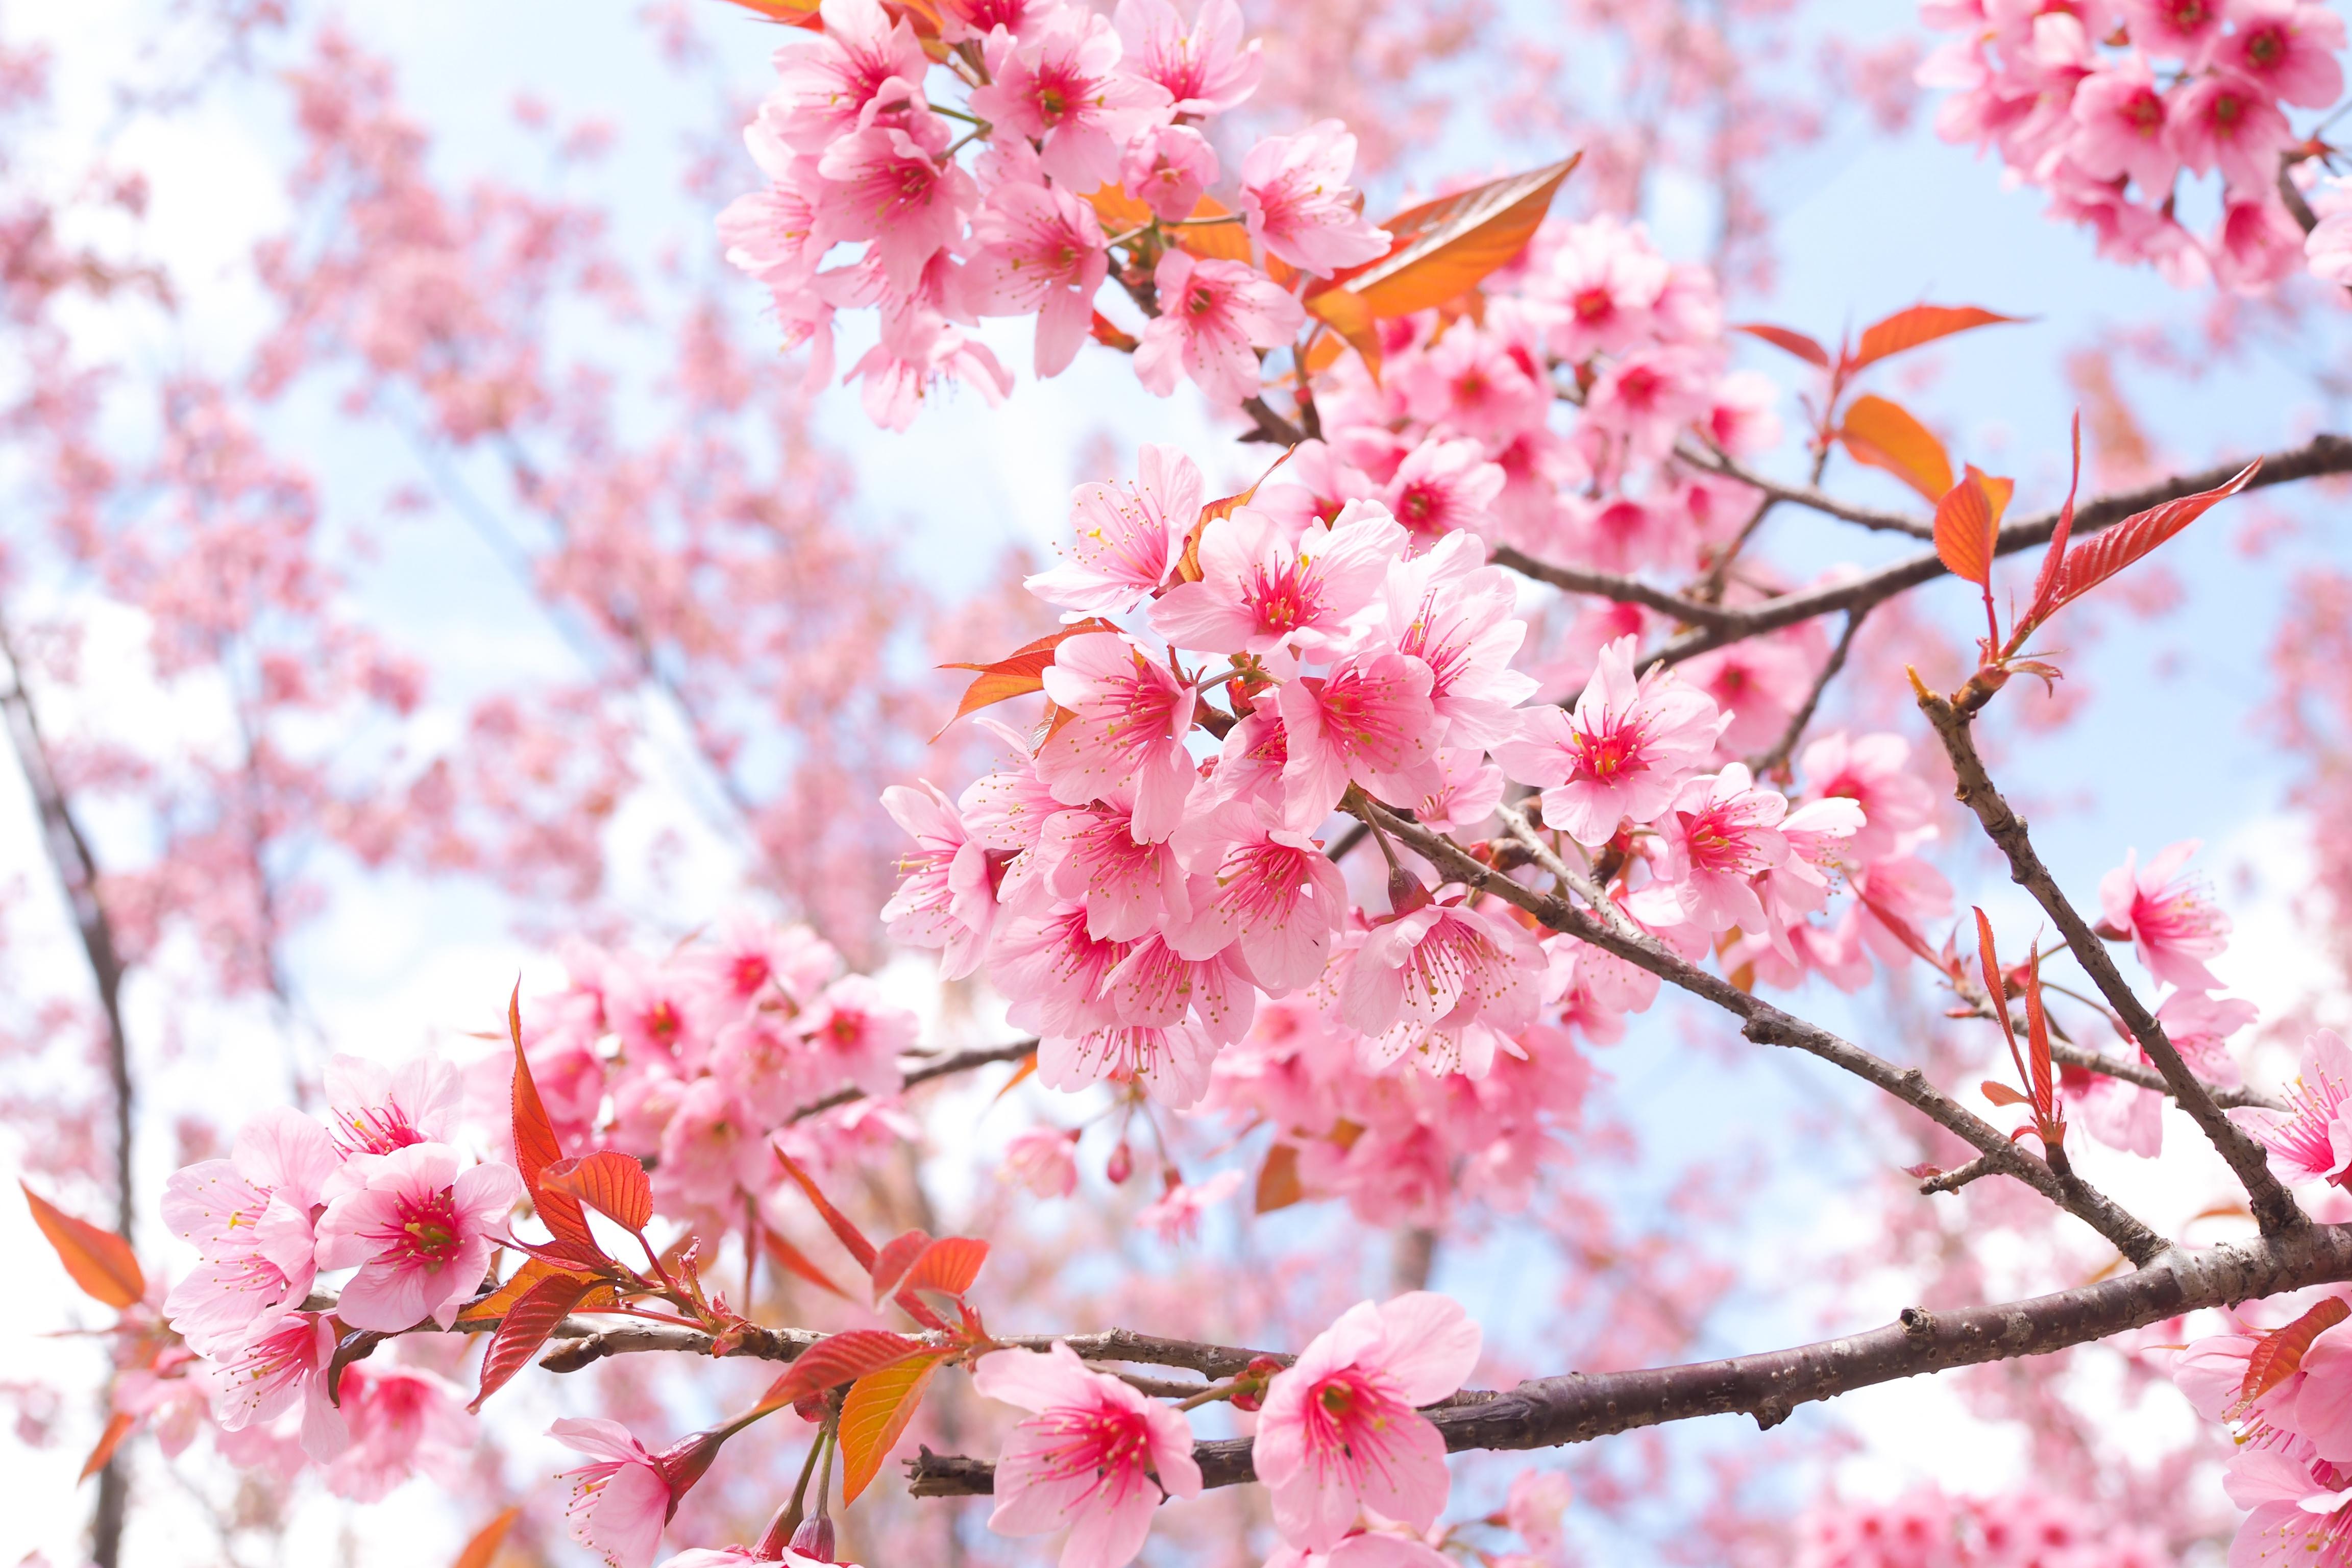 cherry blossom tree branches 4k 1606577835 - Cherry Blossom Tree Branches 4k - Cherry Blossom Tree Branches 4k wallpapers